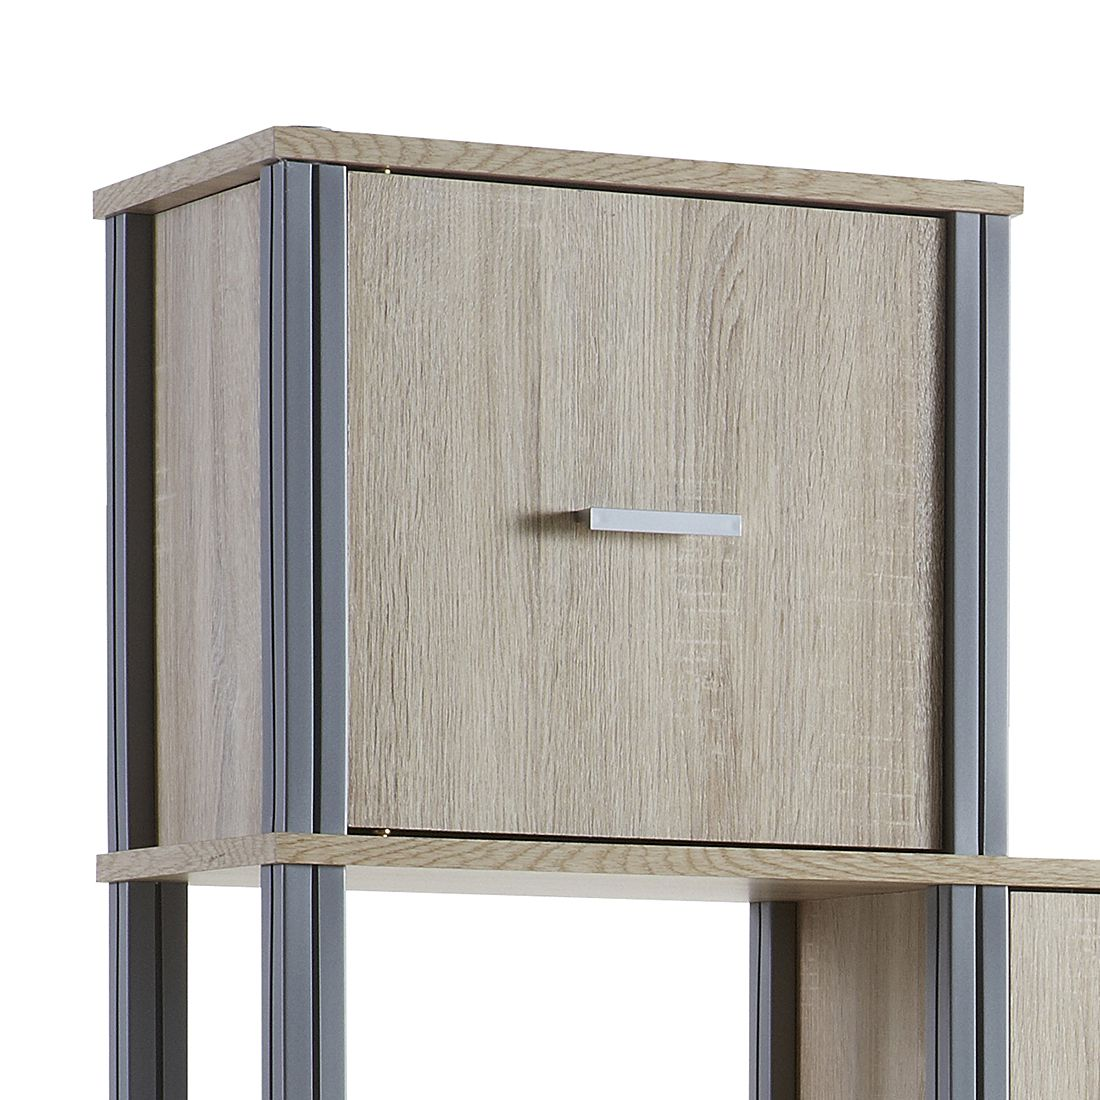 stufenregal berck eiche sonoma dekor b cherregal standregal wandregal ebay. Black Bedroom Furniture Sets. Home Design Ideas